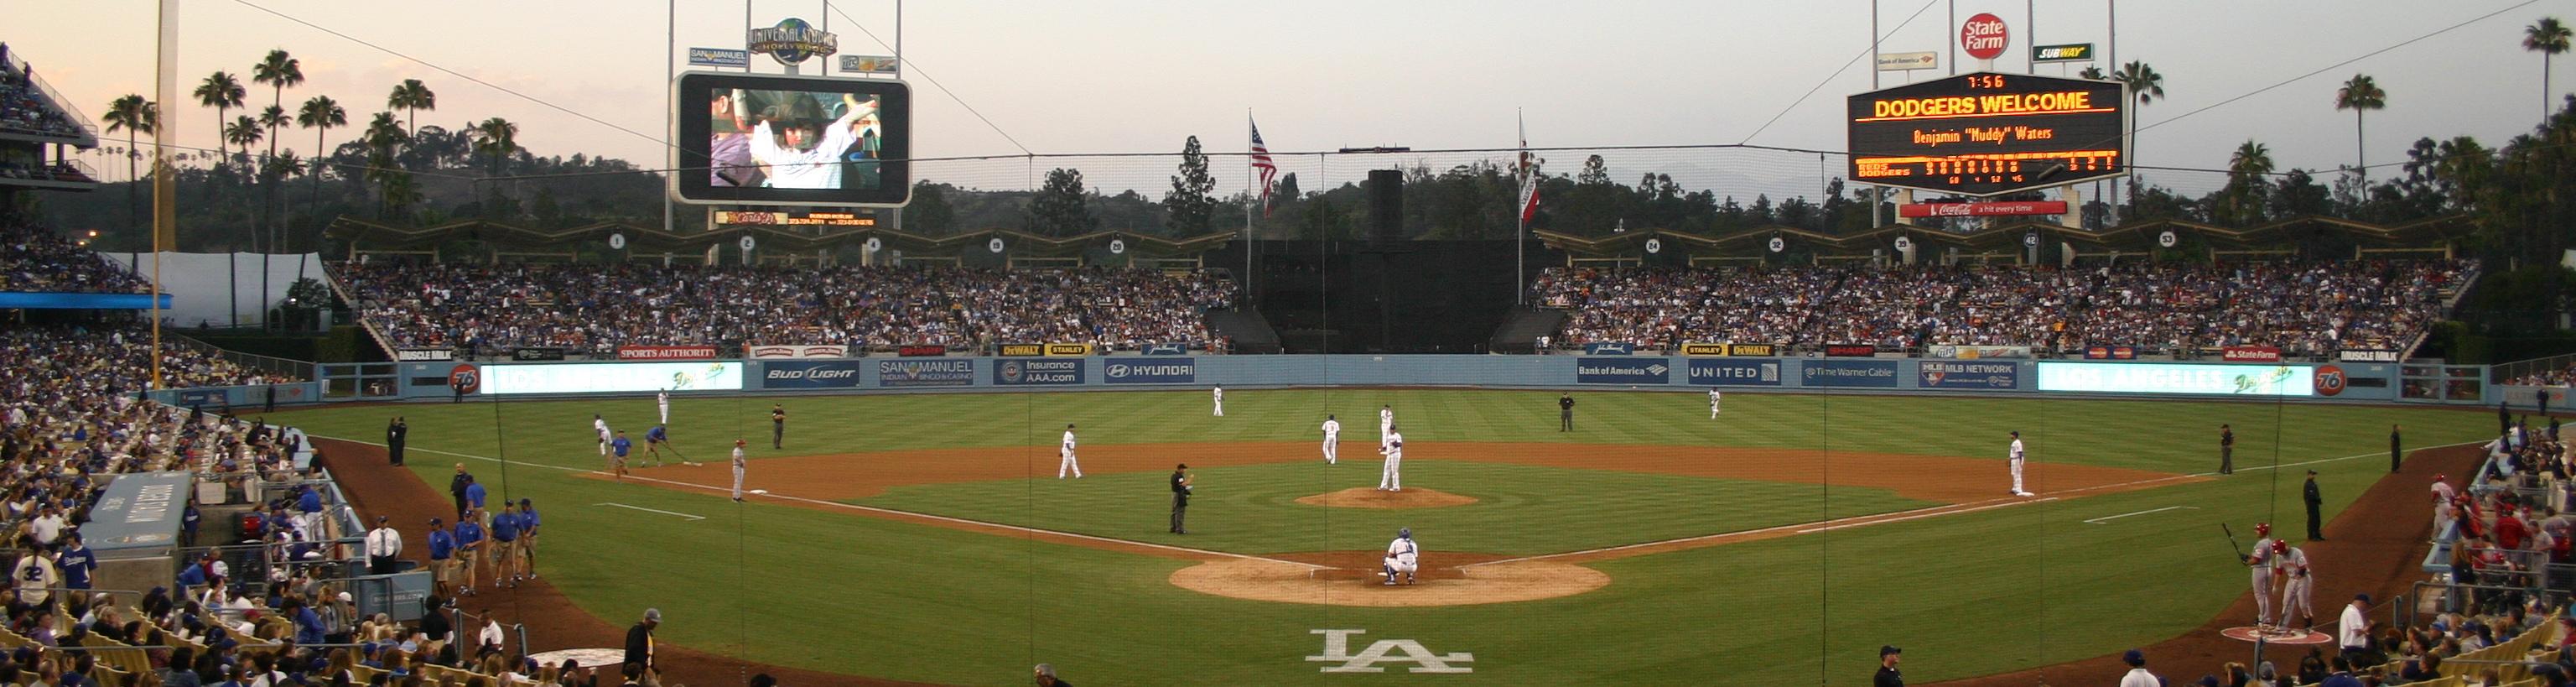 Dodger Stadium,West Coast Baseball Tour,Baseball Road Trip